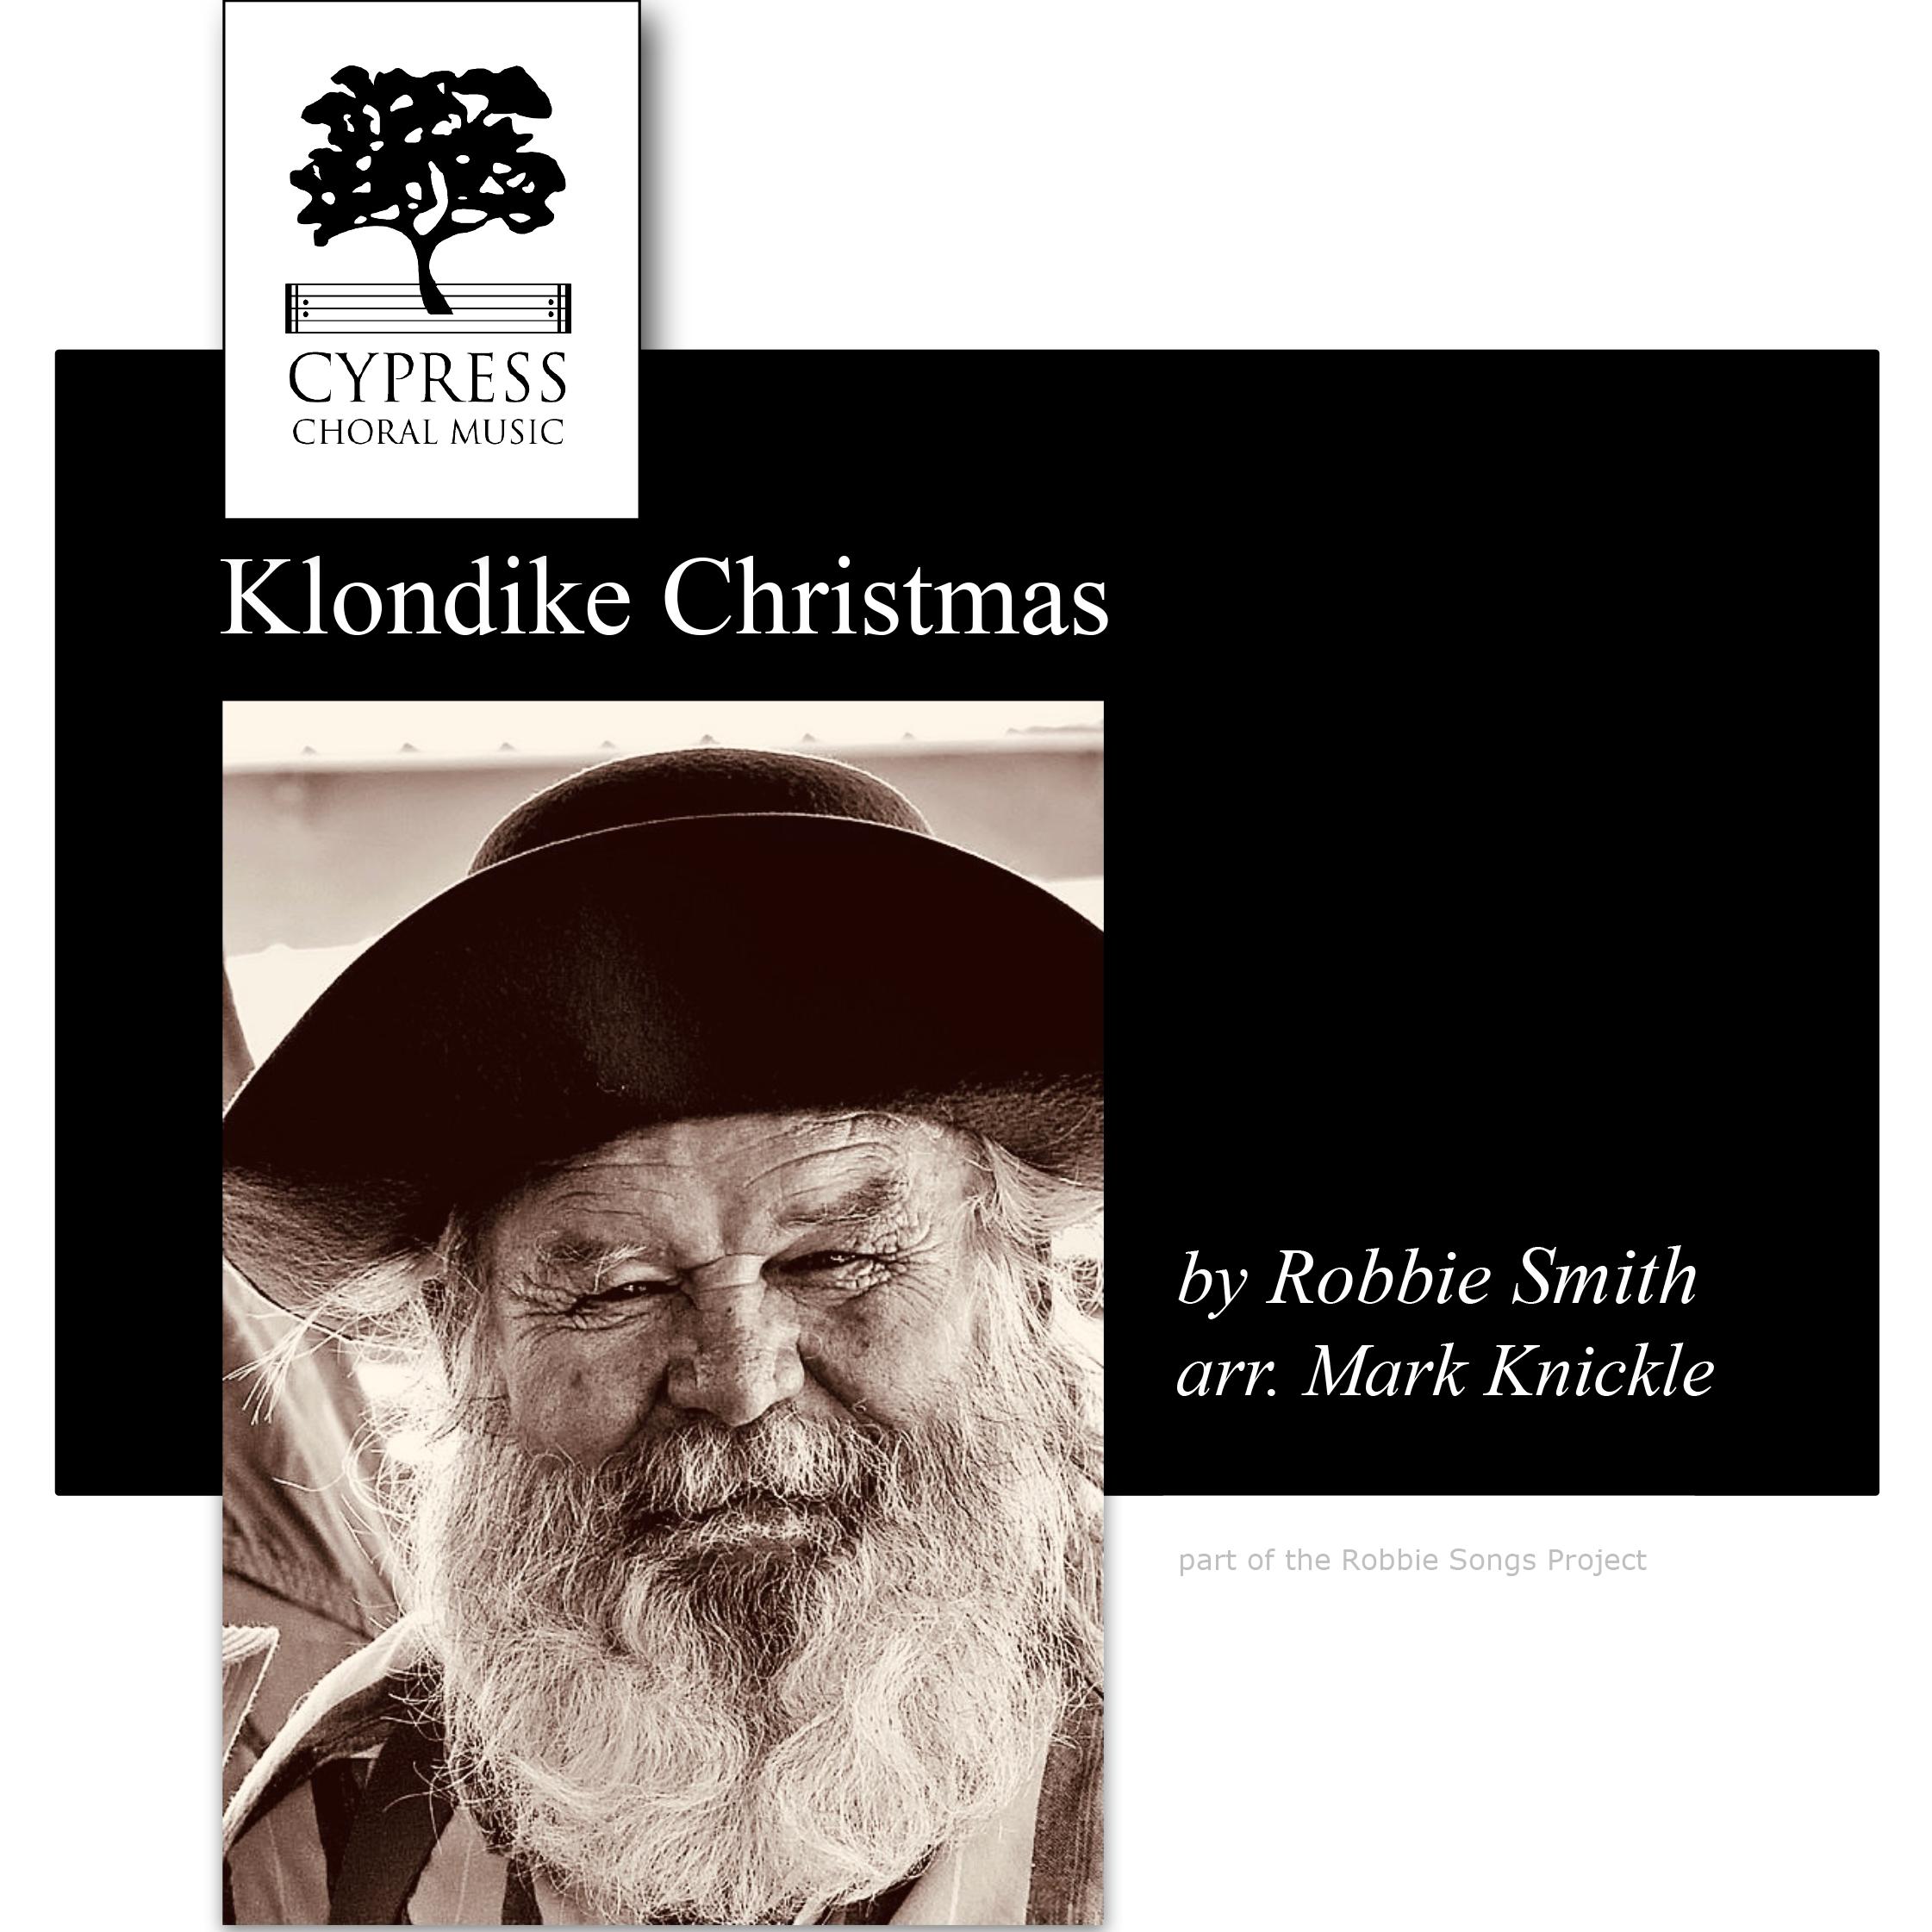 CP 1945-Klondike Christmas-thumb